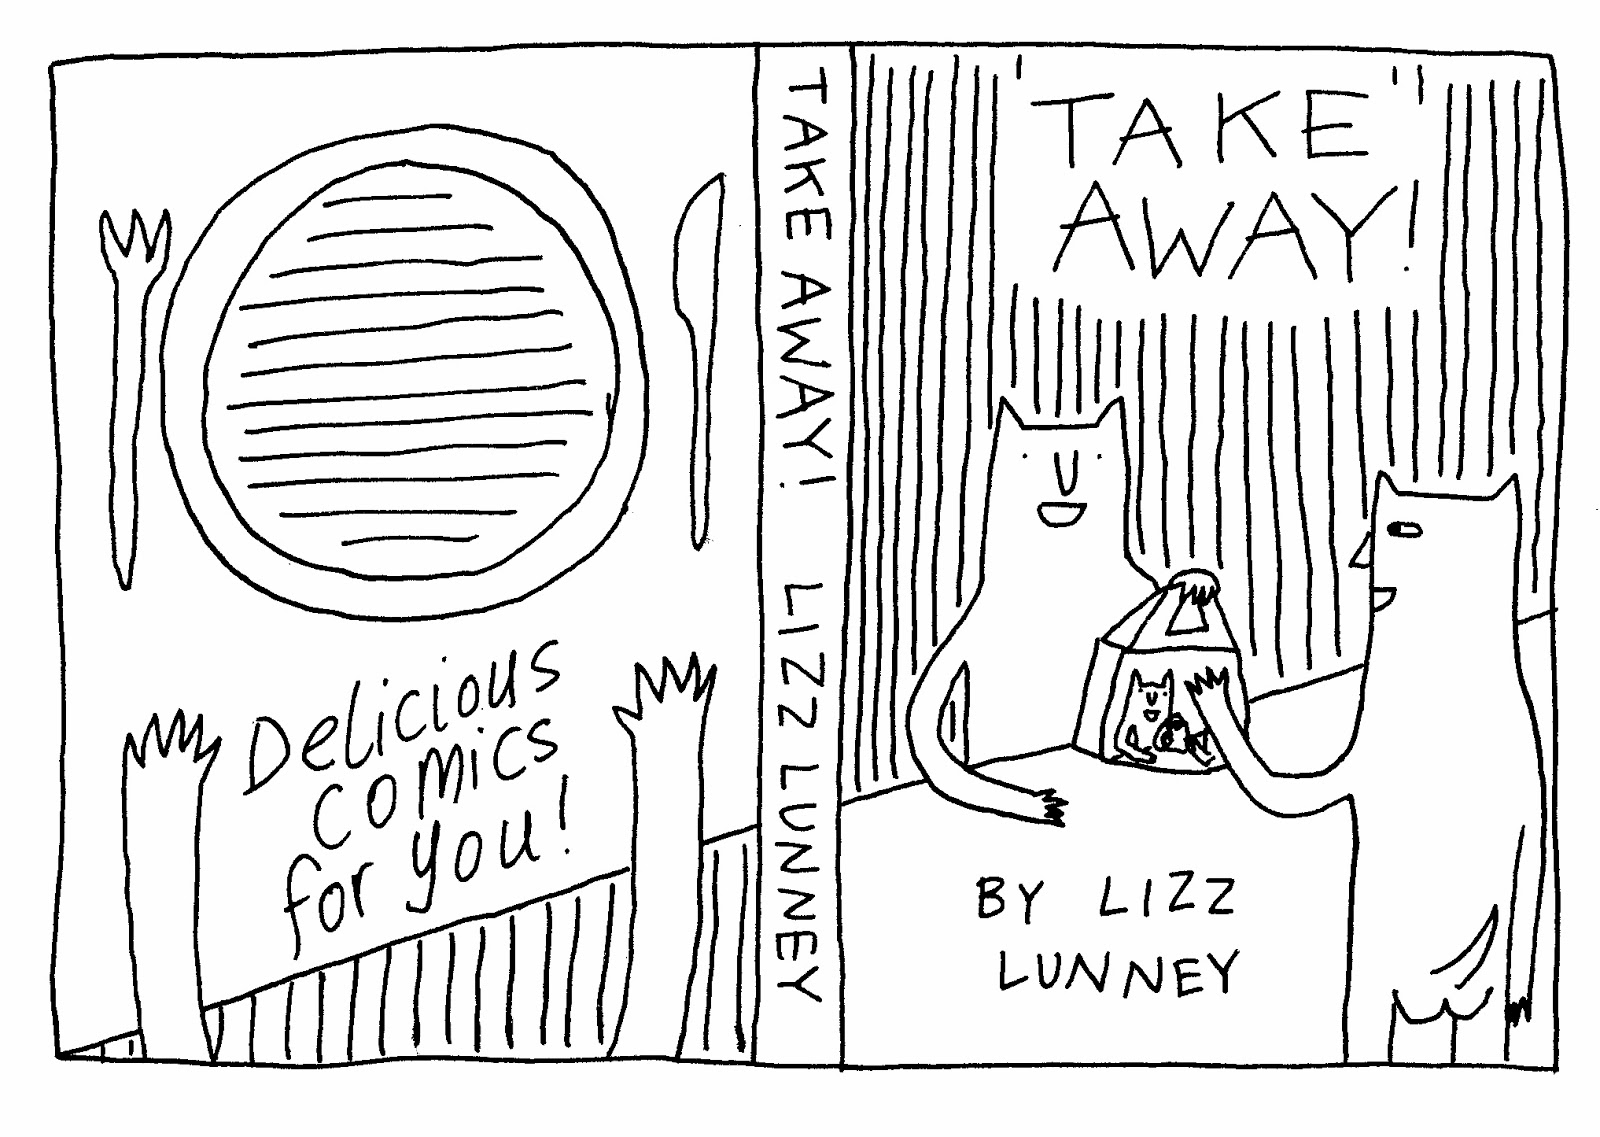 Lizzlizz- The blog bog!: Take Away! Cover Design